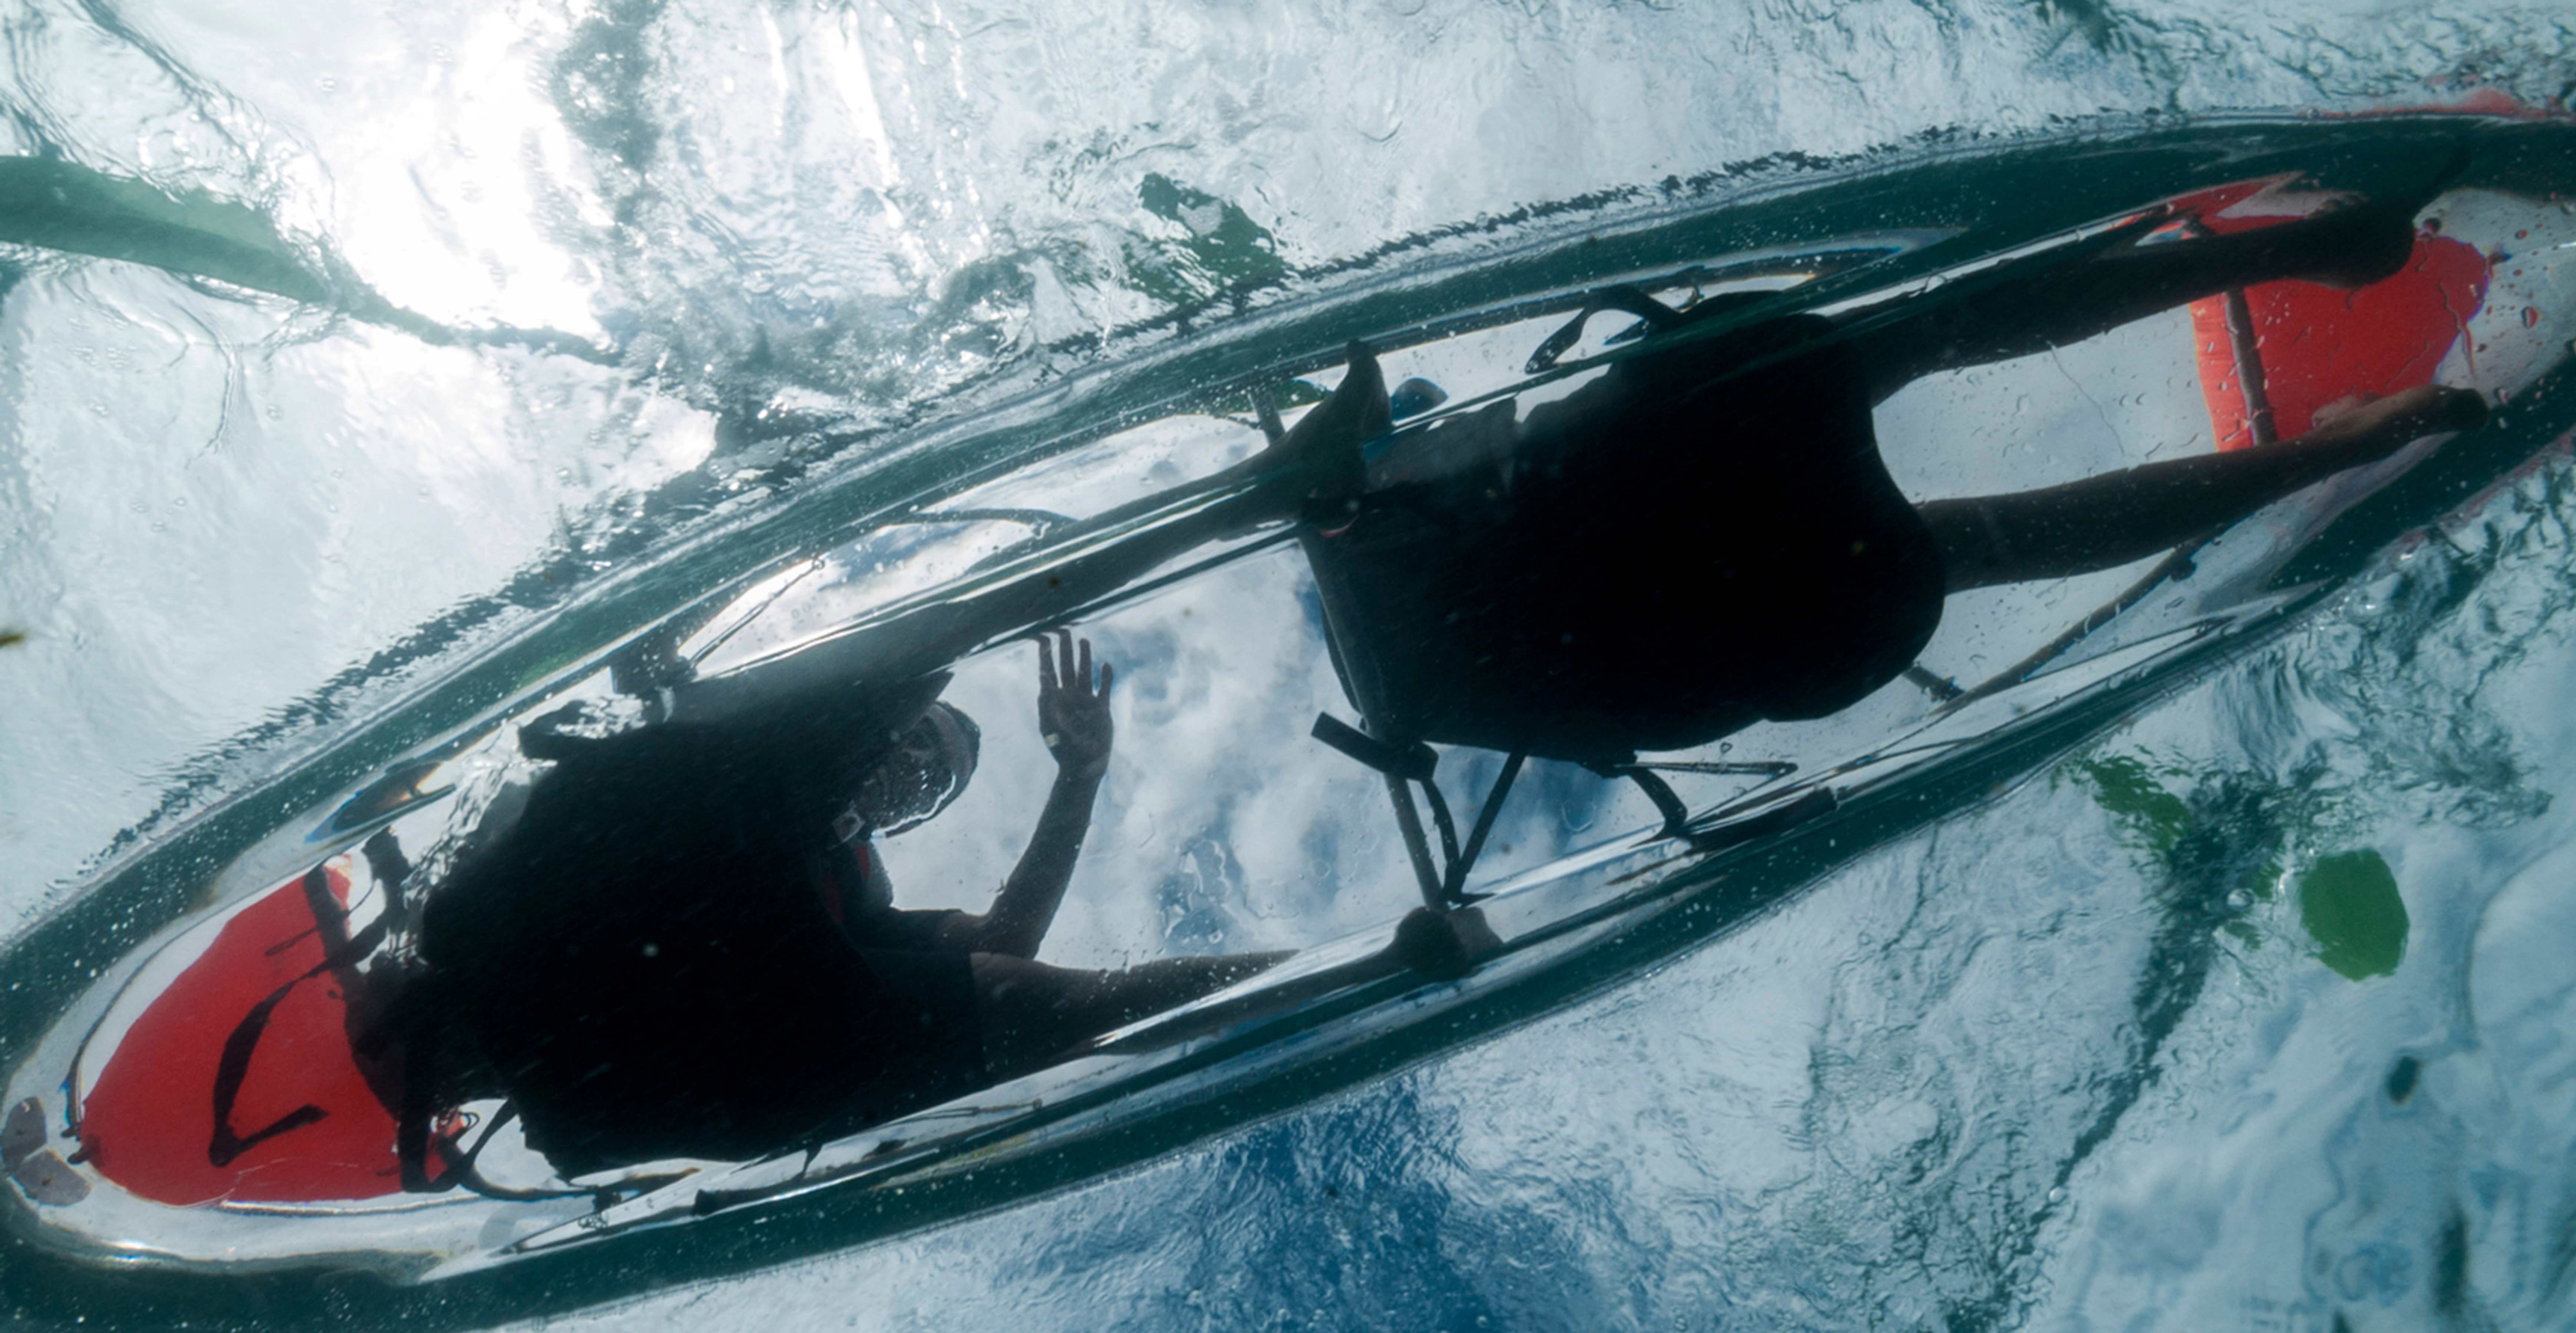 Alquiler de kayak transparente 30 min